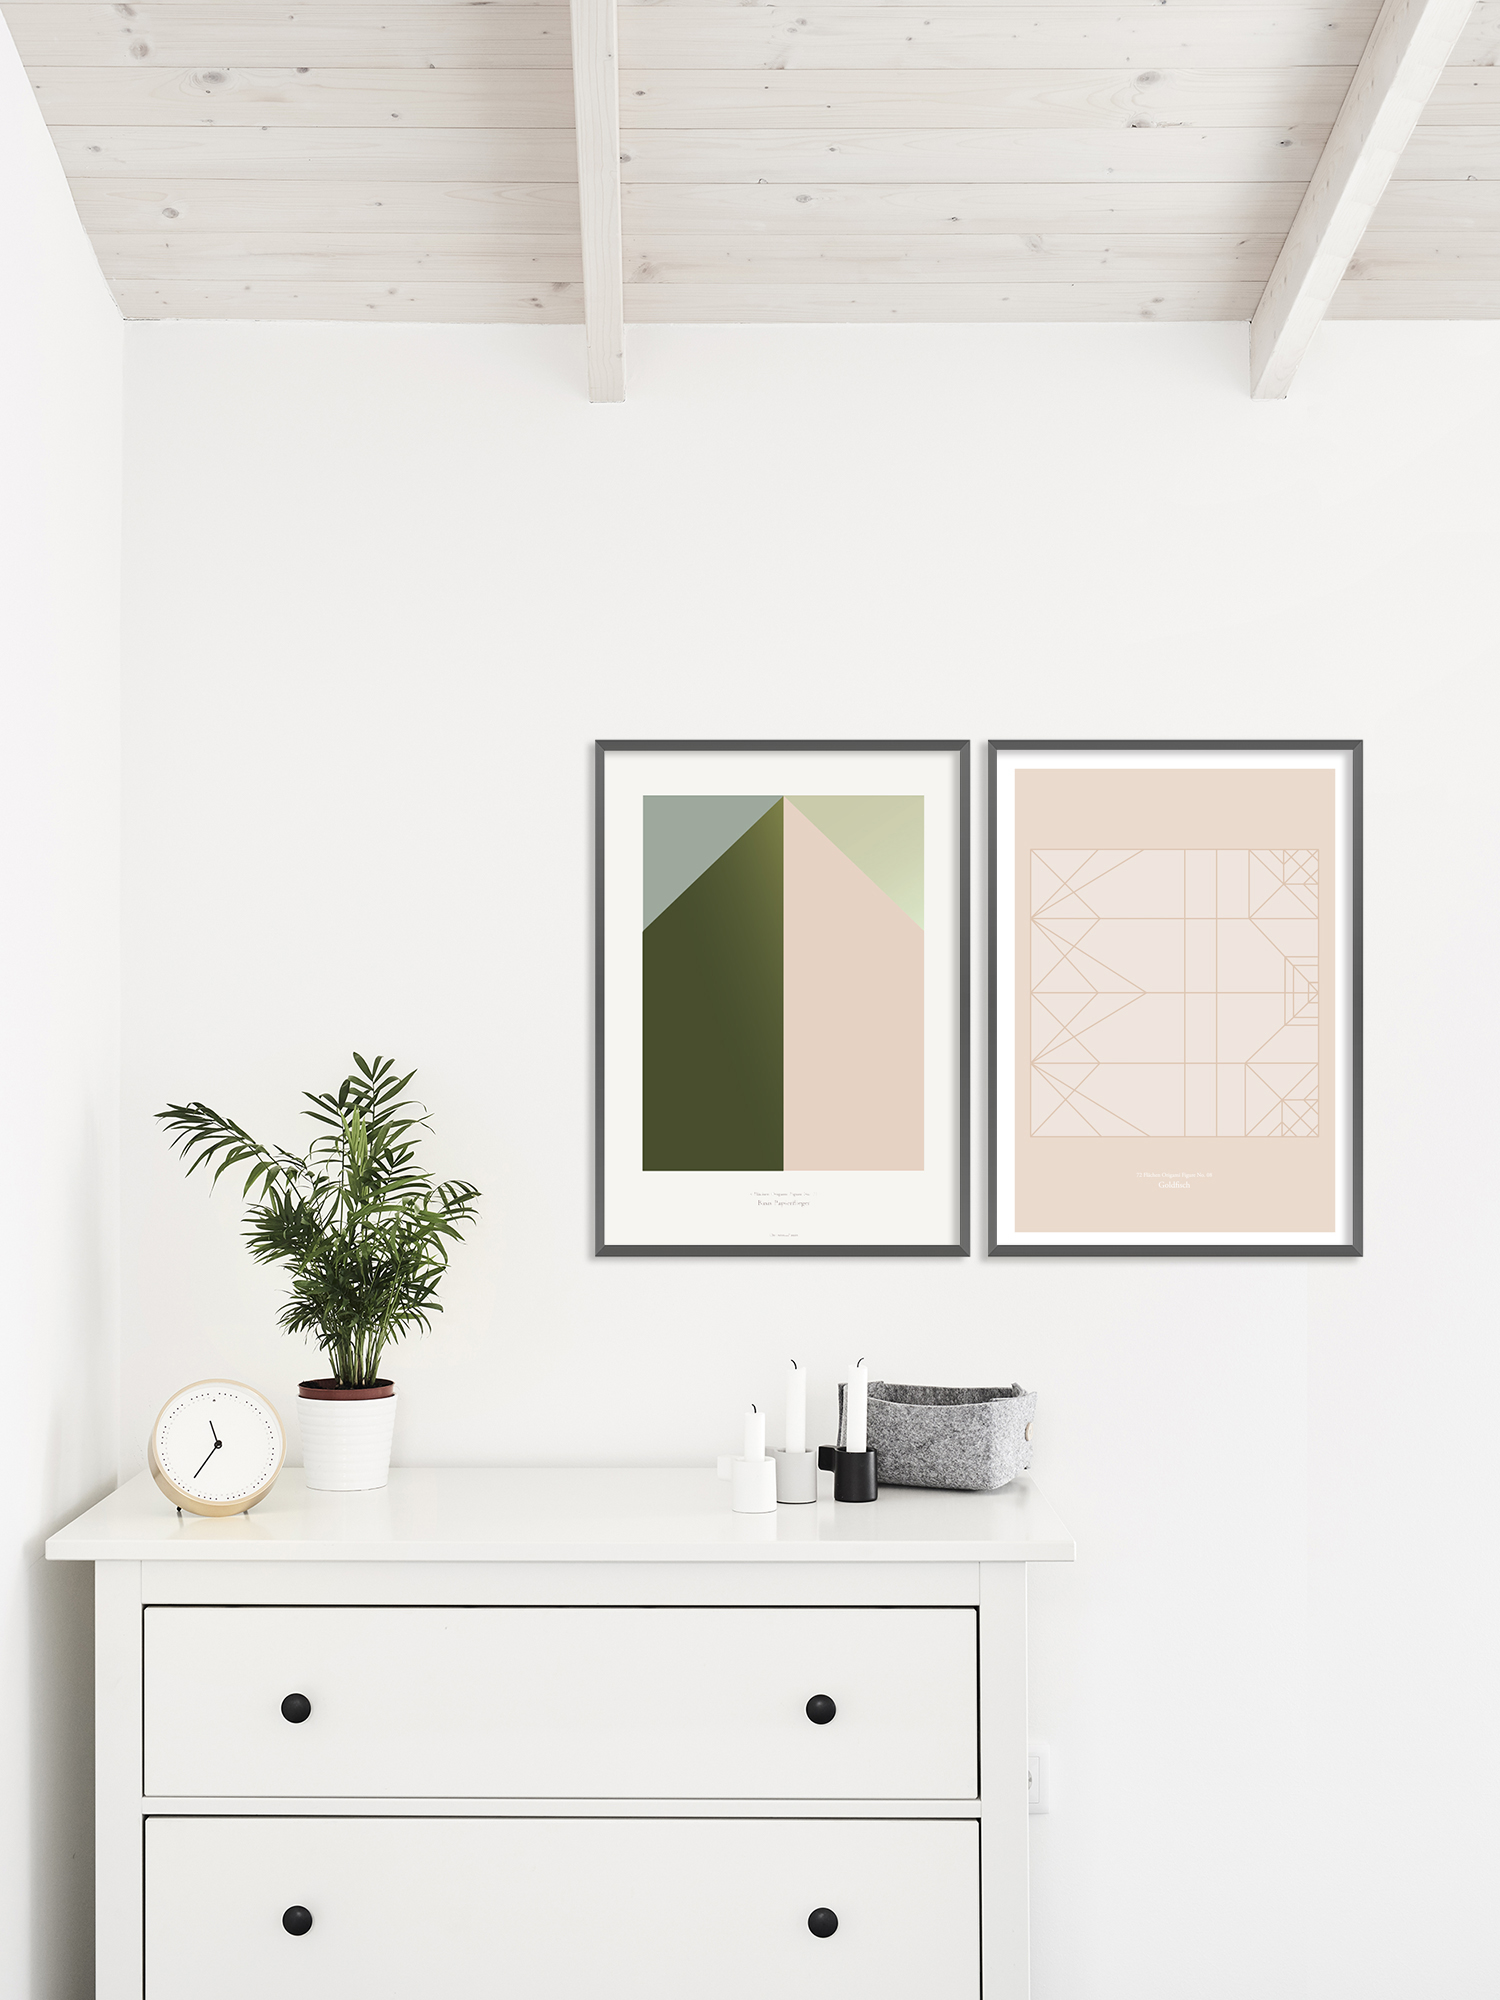 Christina-Pauls-Kunstdruck-Print-Poster-Origami-mehrfarbig-Papierflieger3.jpg